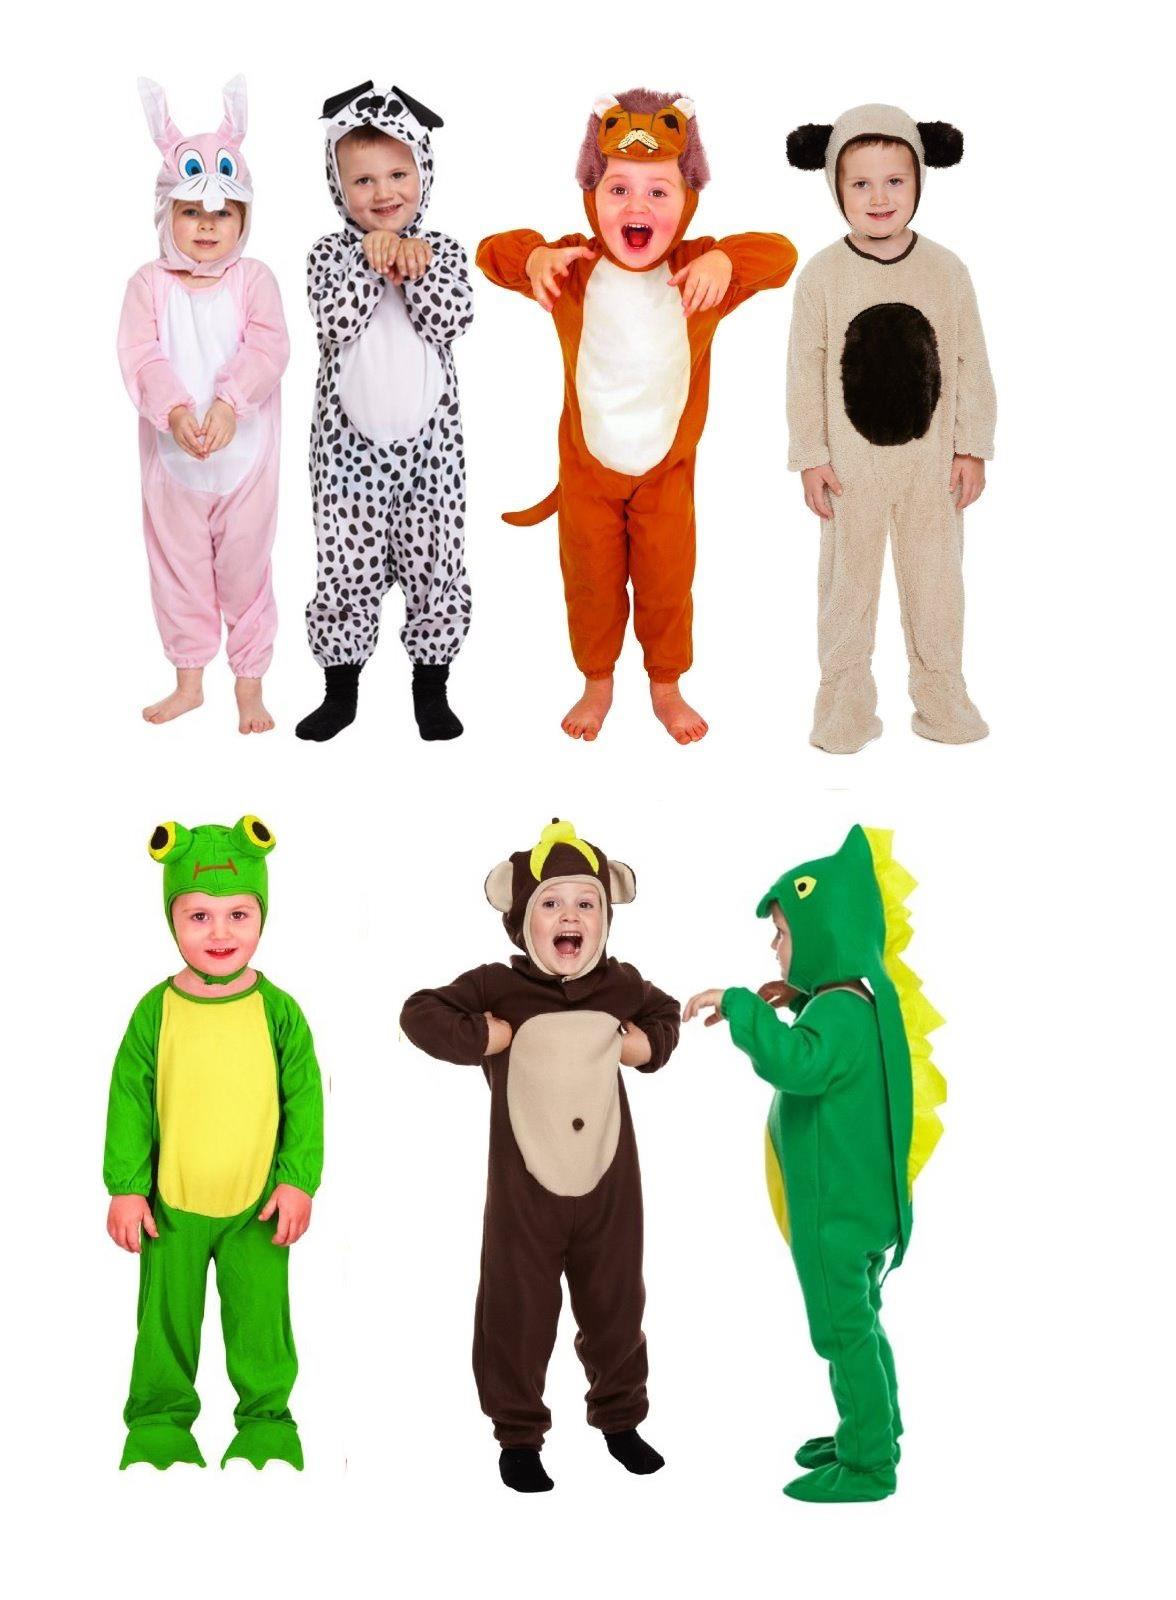 childrens dinosaur costume fancy dress animal playsuit book week toddler age 2 3